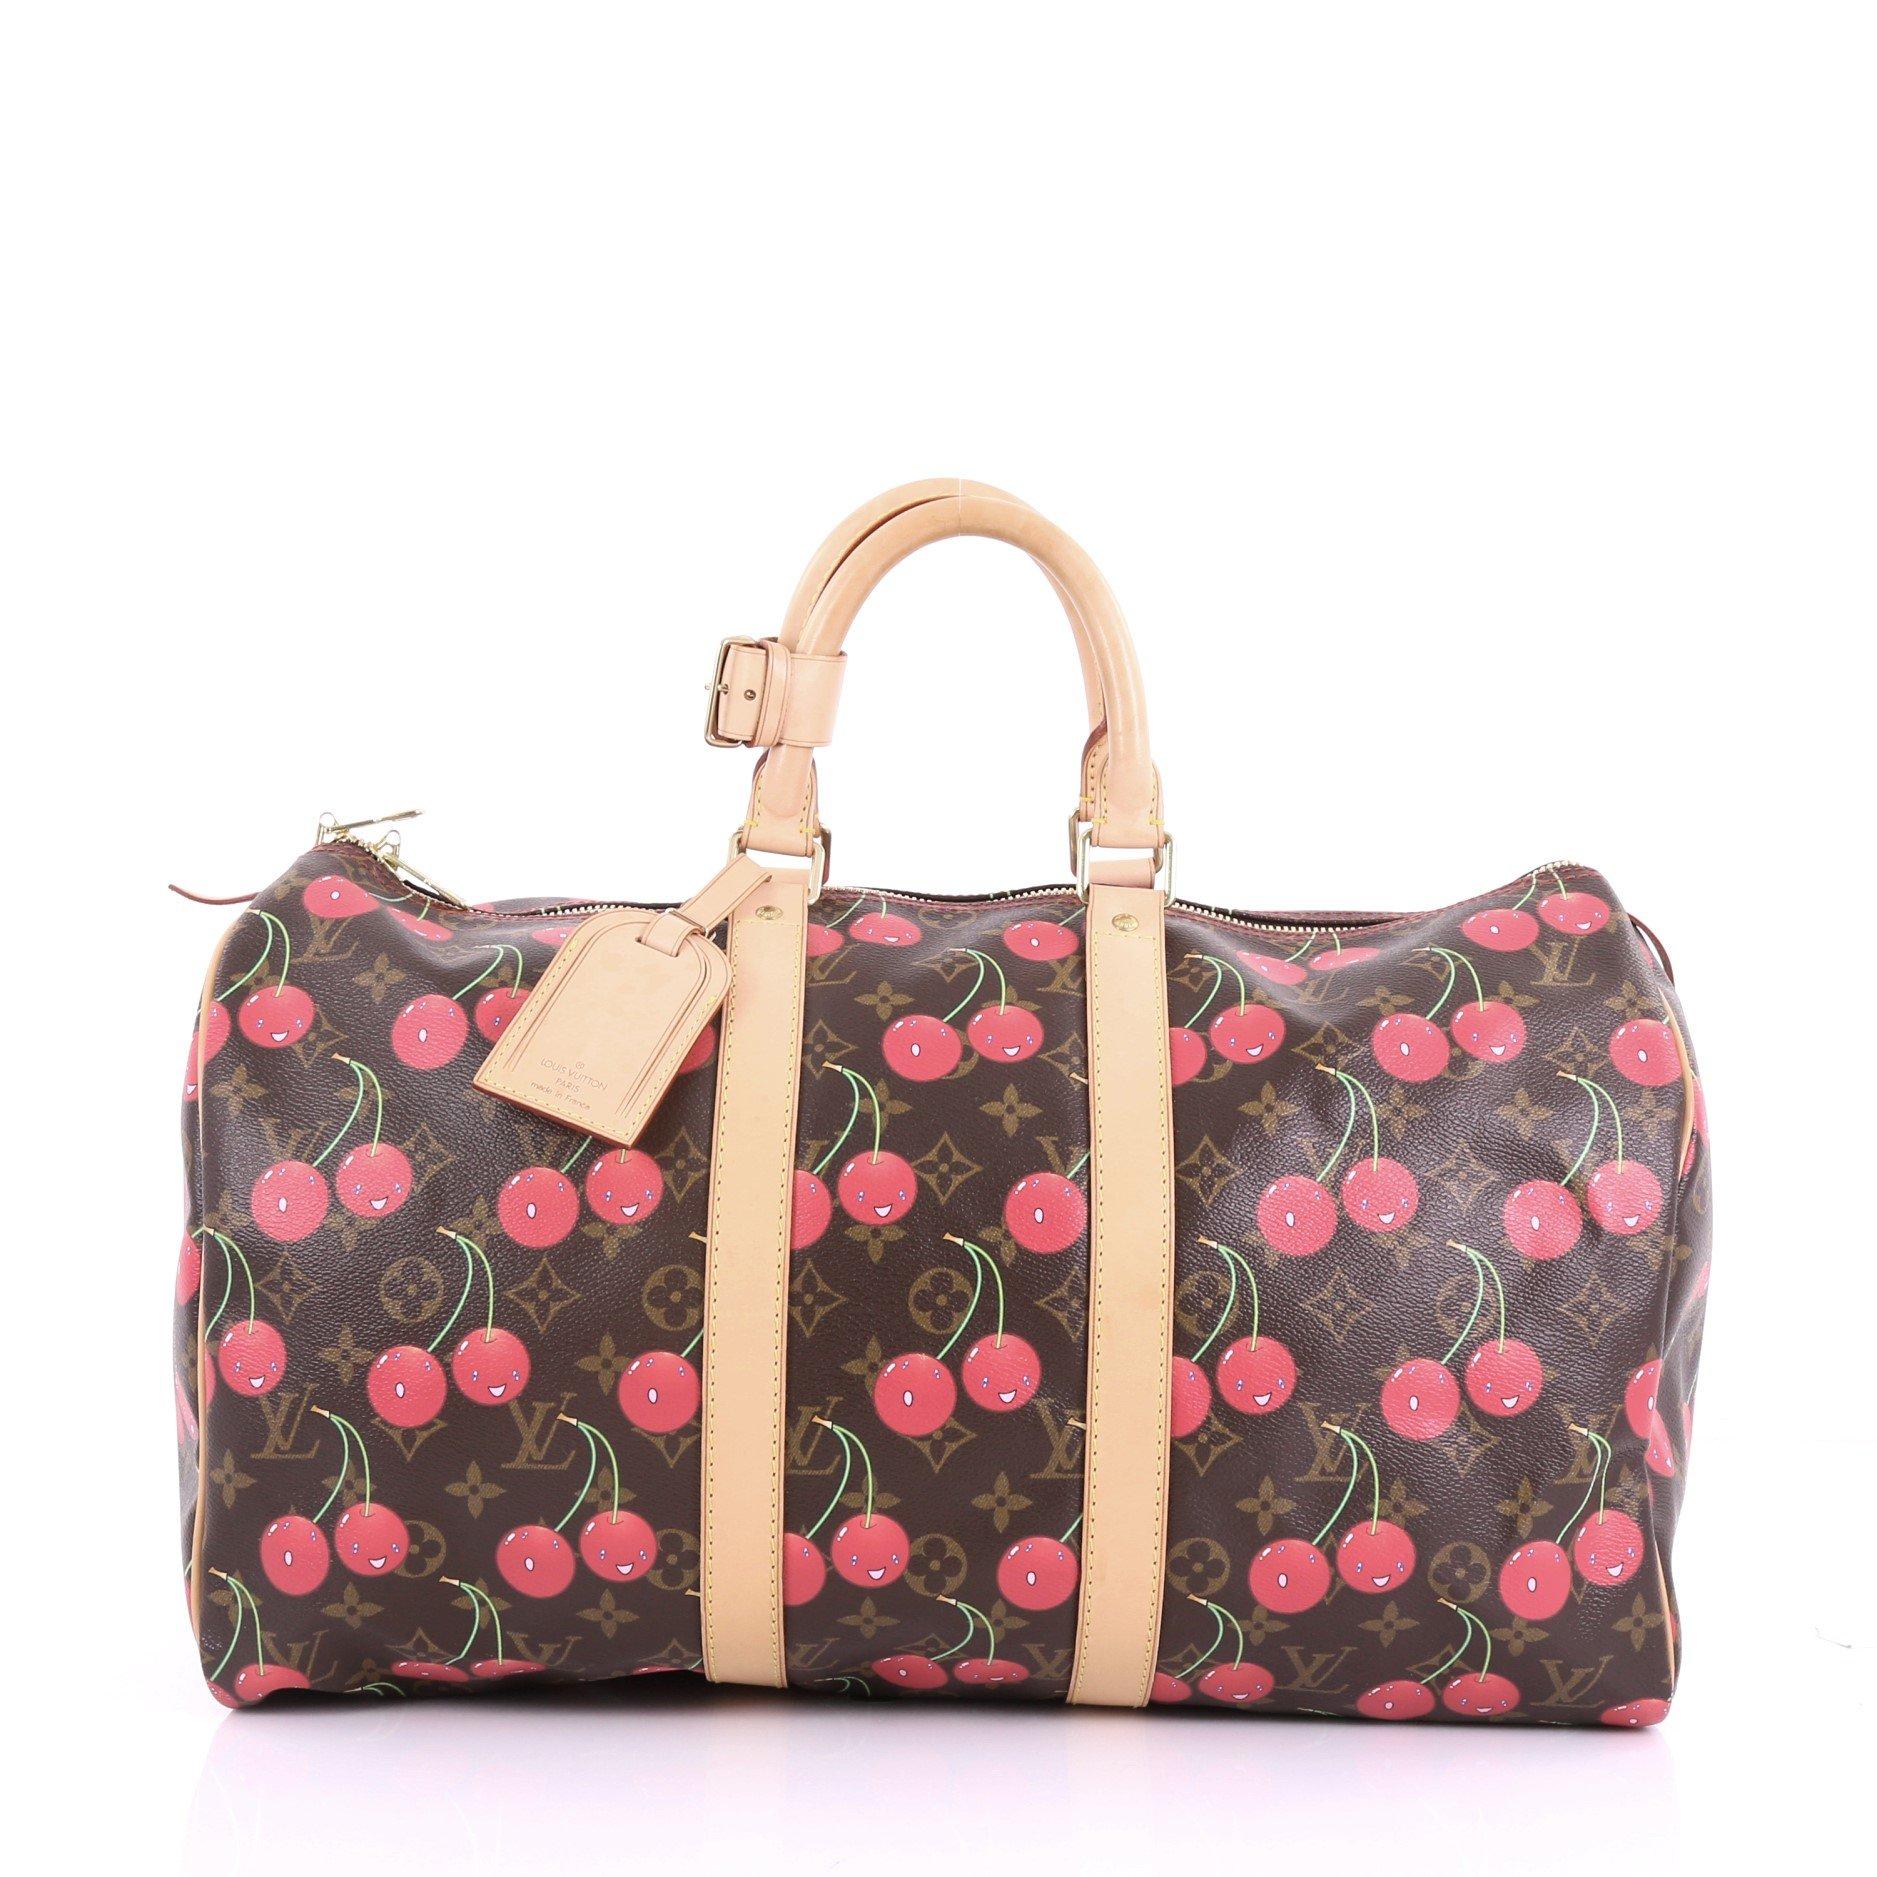 Louis Vuitton Keepall Bag Cerises